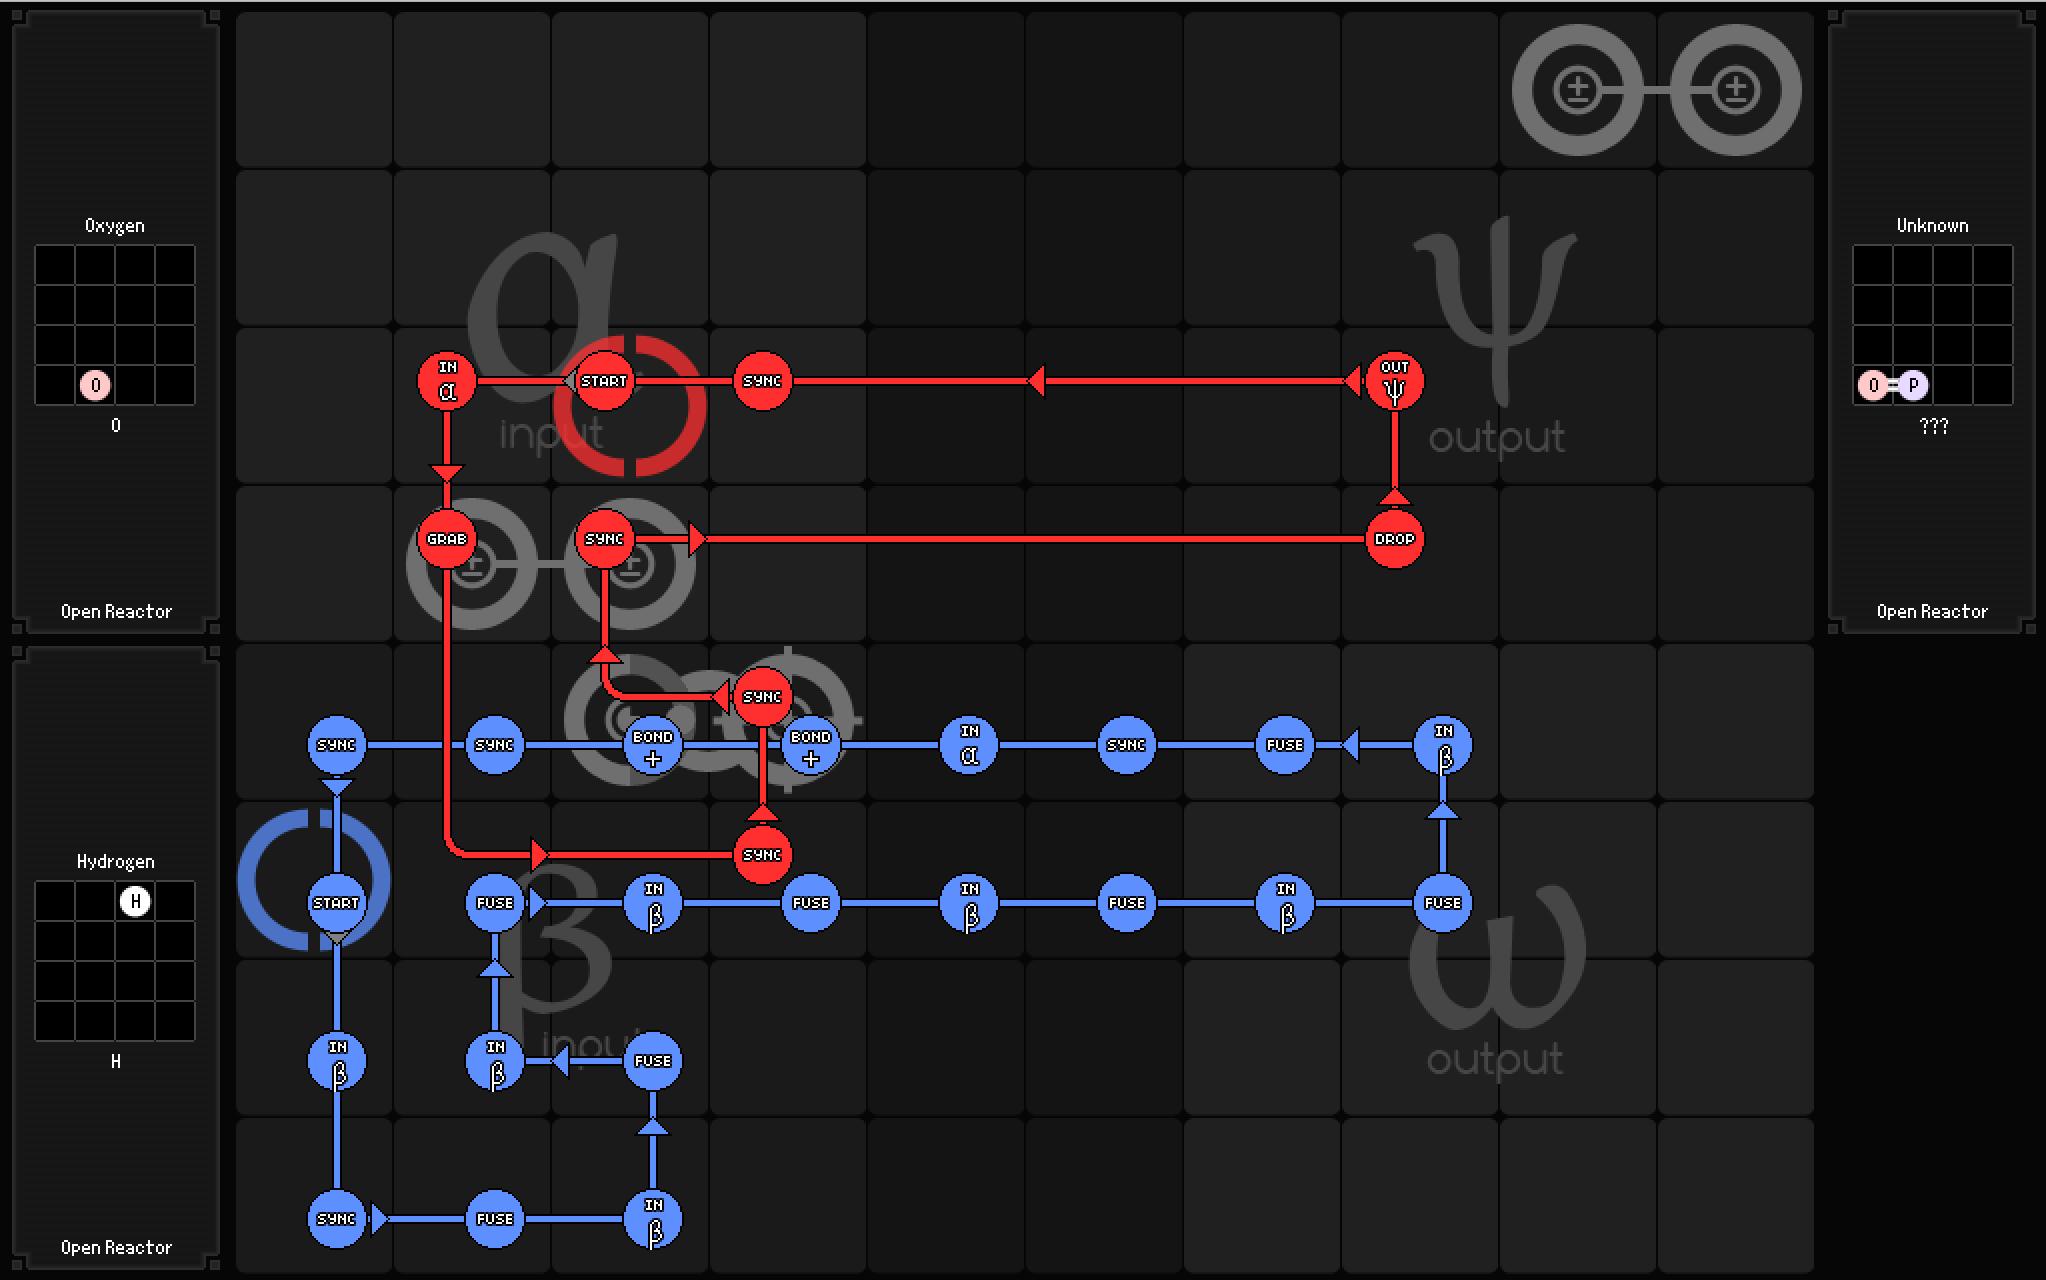 1_Story_Mode/5_Sikutar/SpaceChem-5.5.a/Reactor_3.png